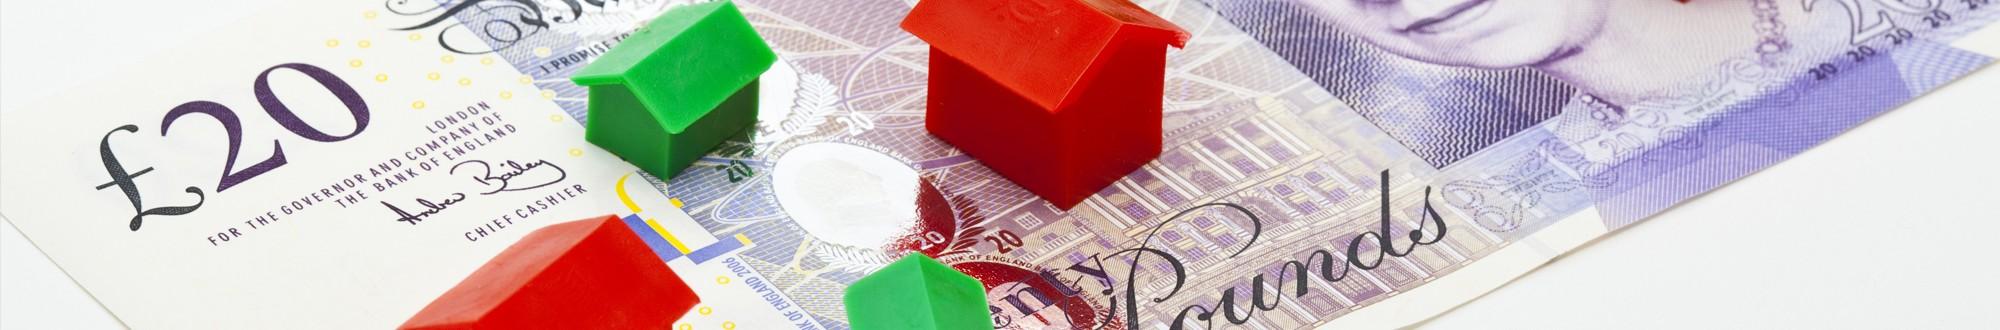 Nottingham Mortgage Adviser - Money Advice